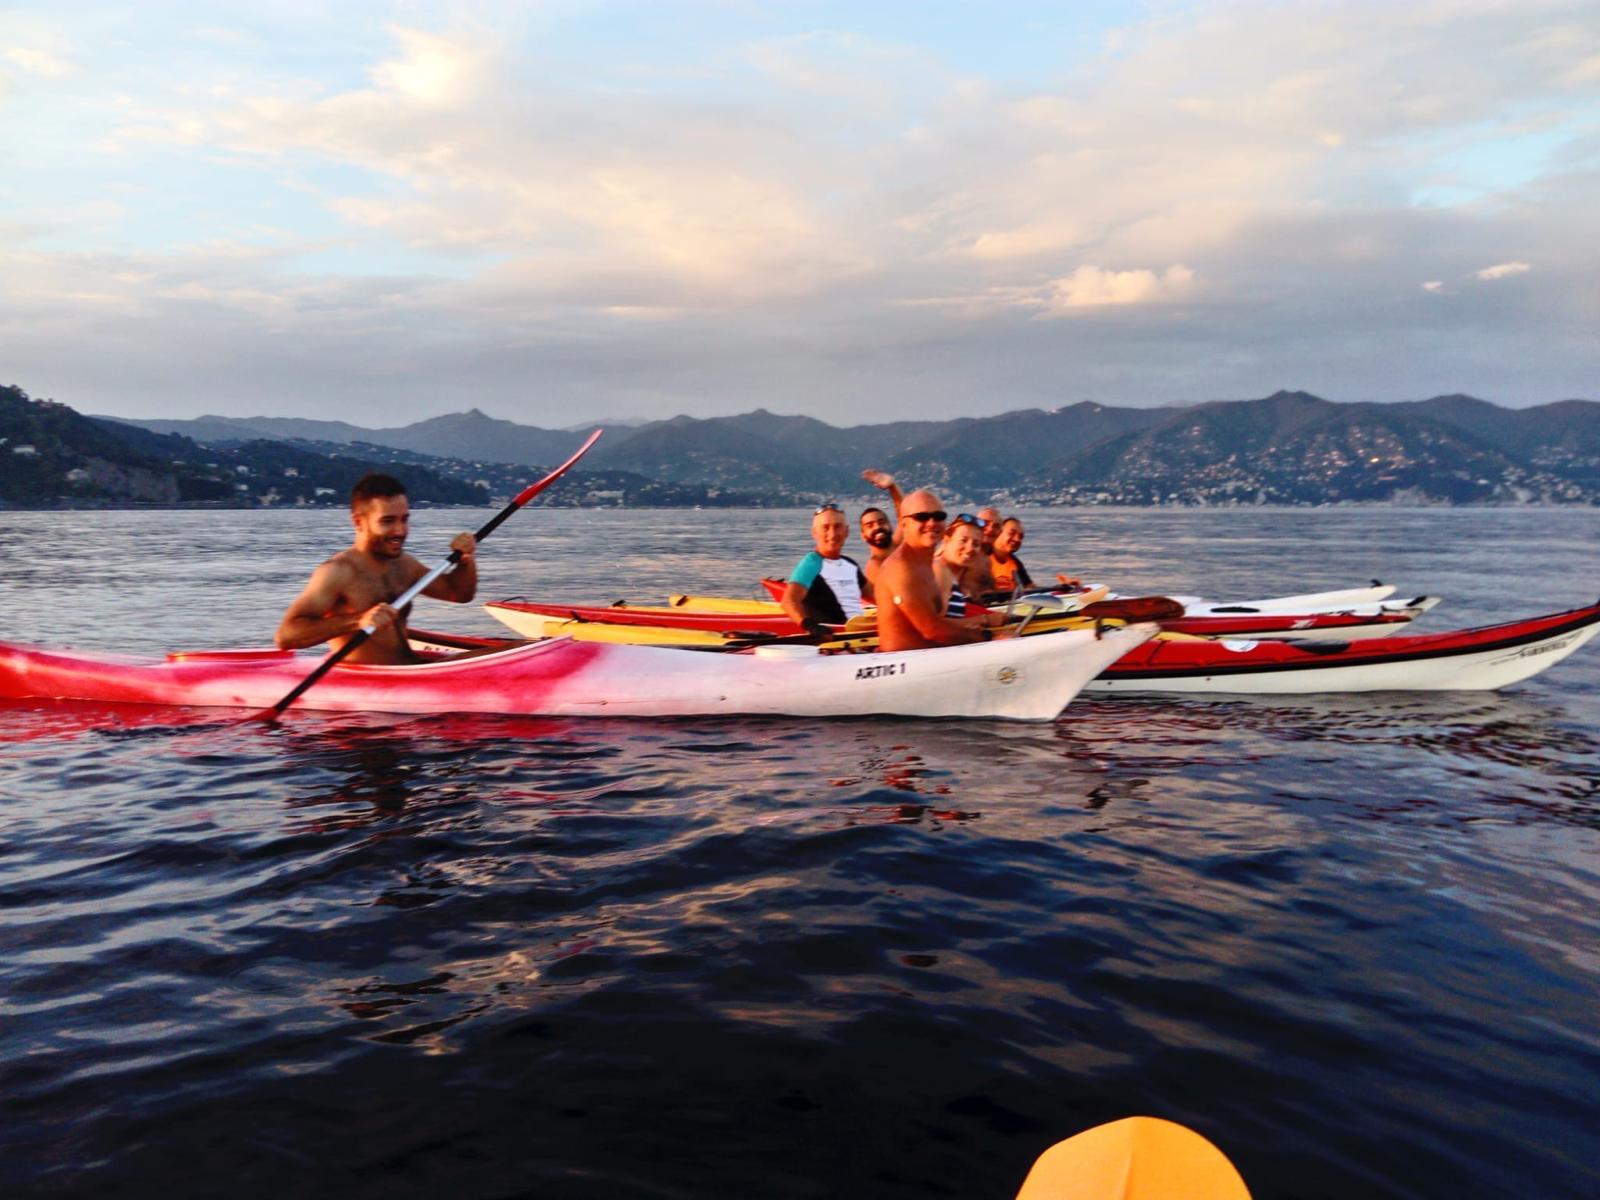 noleggio_canoe_due_posti_2_KAYAK